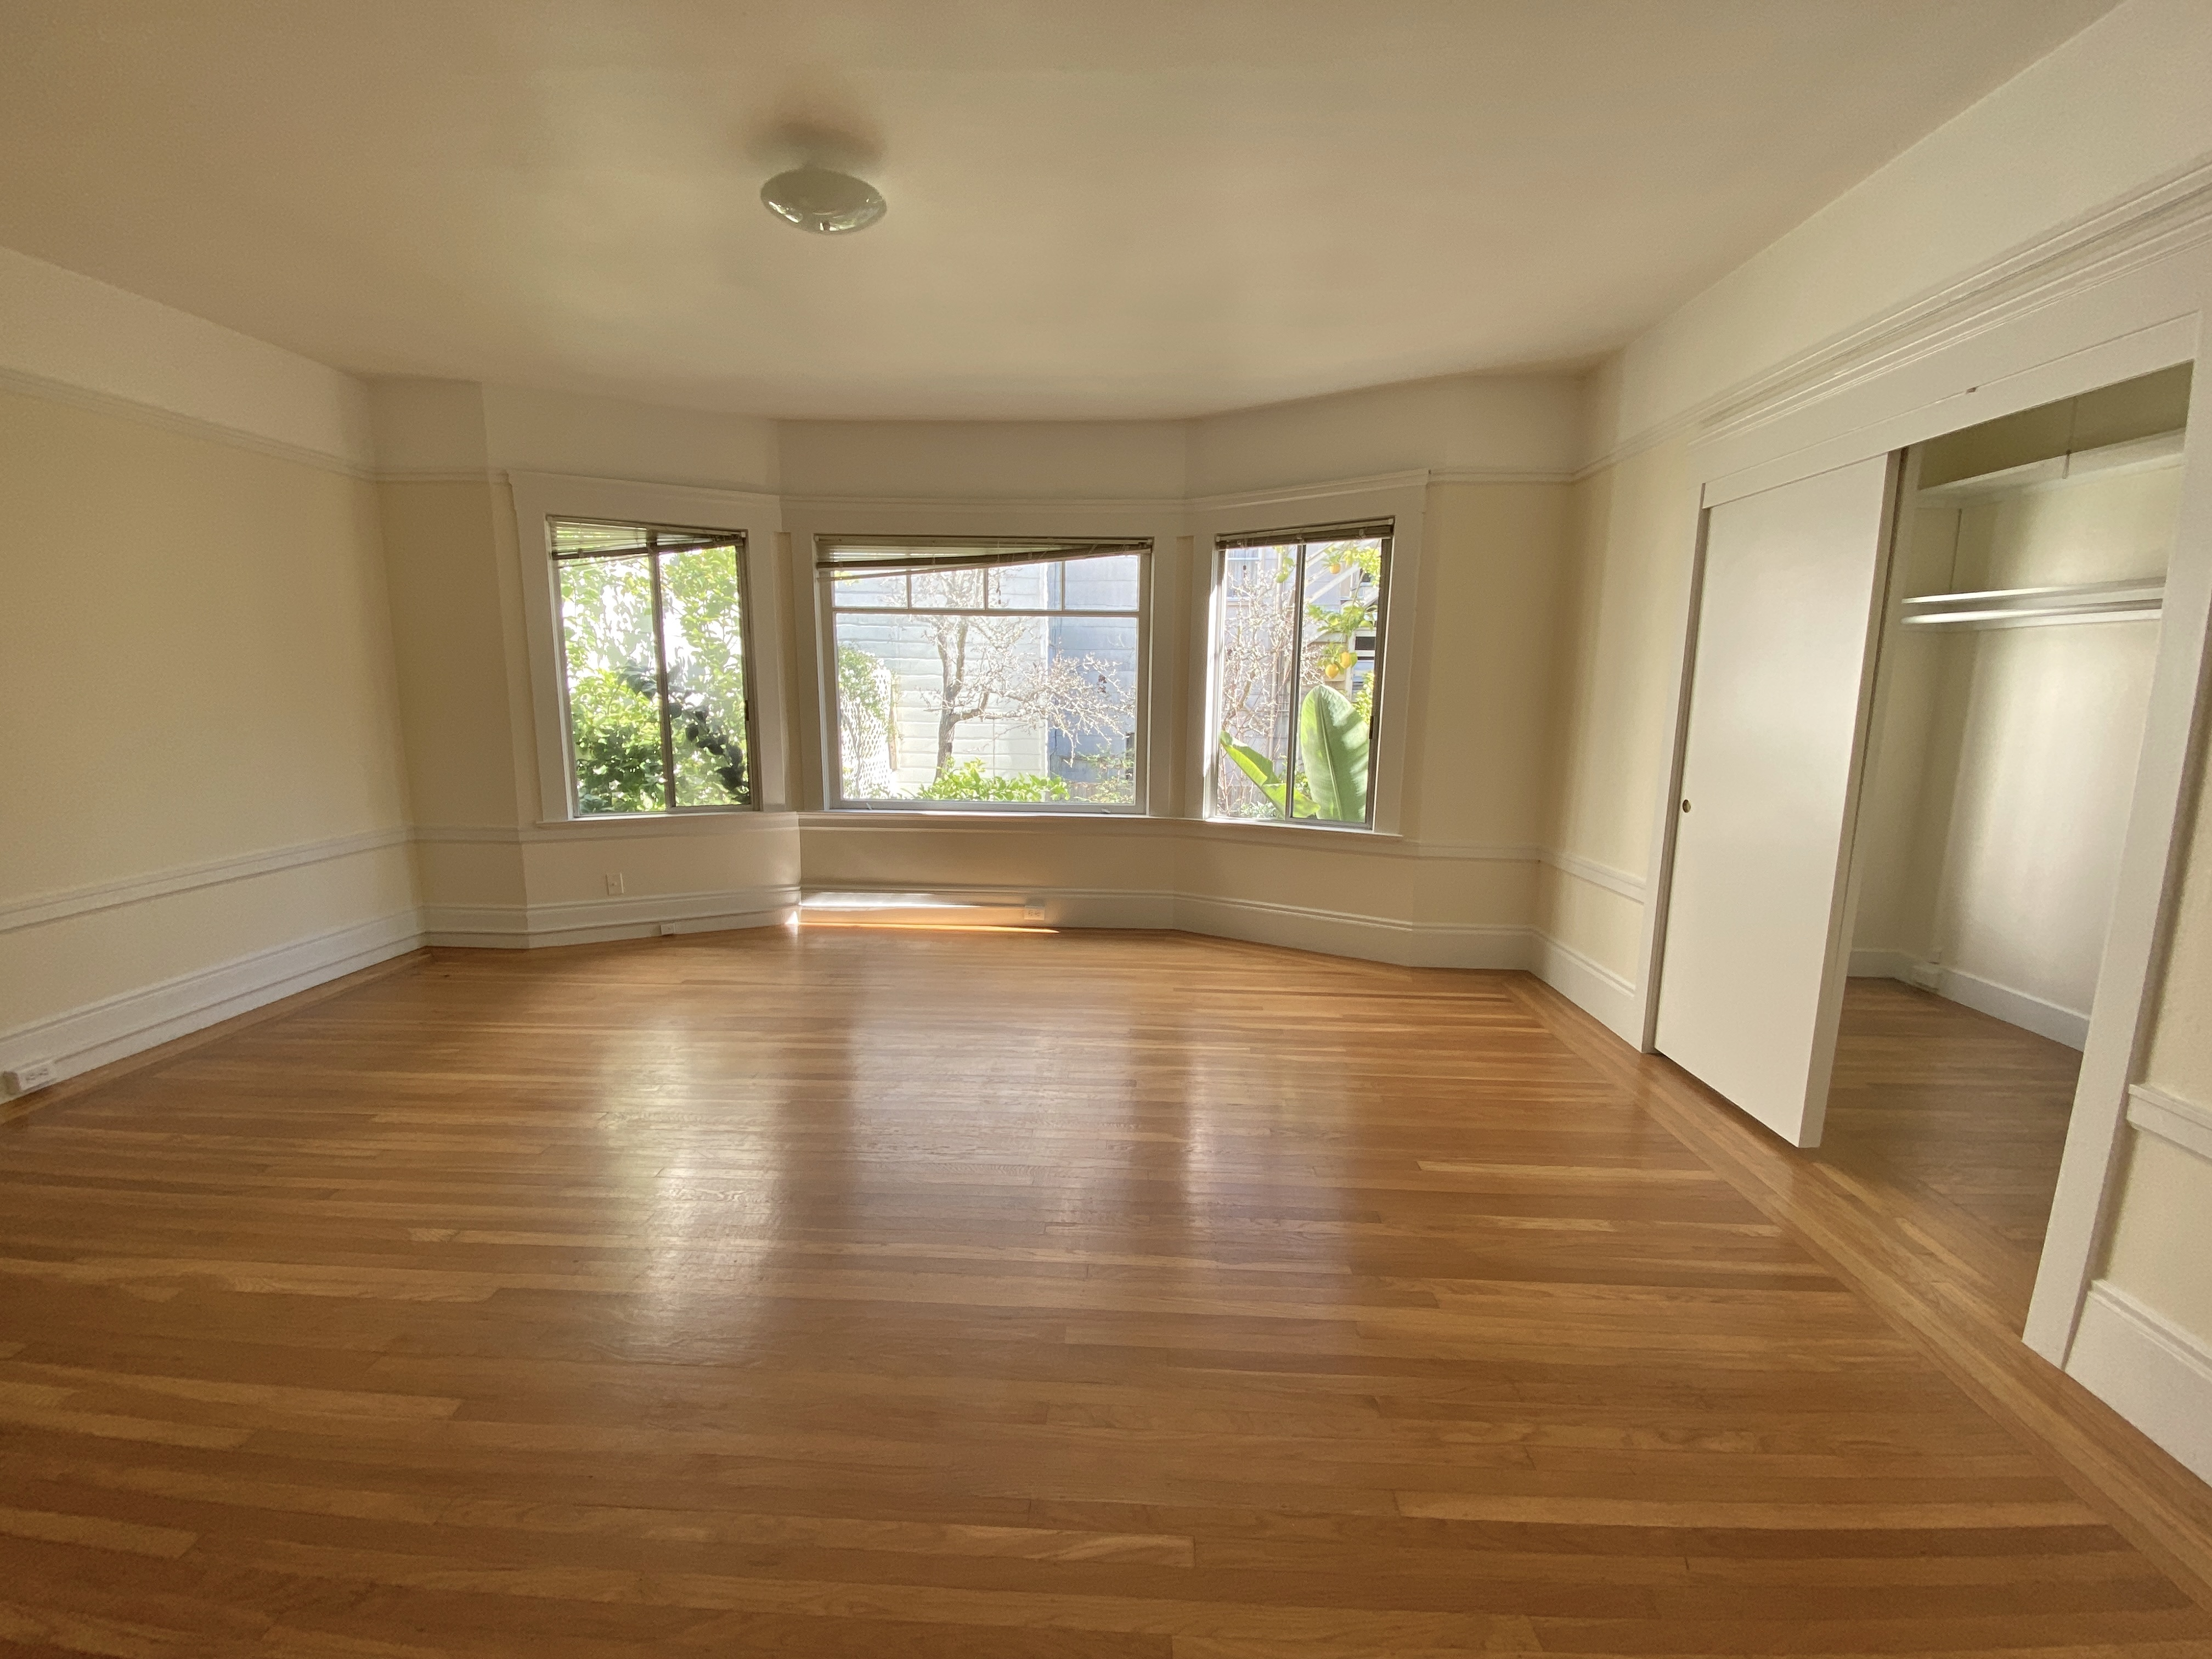 3156 Gough Street  # 2, San Francisco, CA, 94123